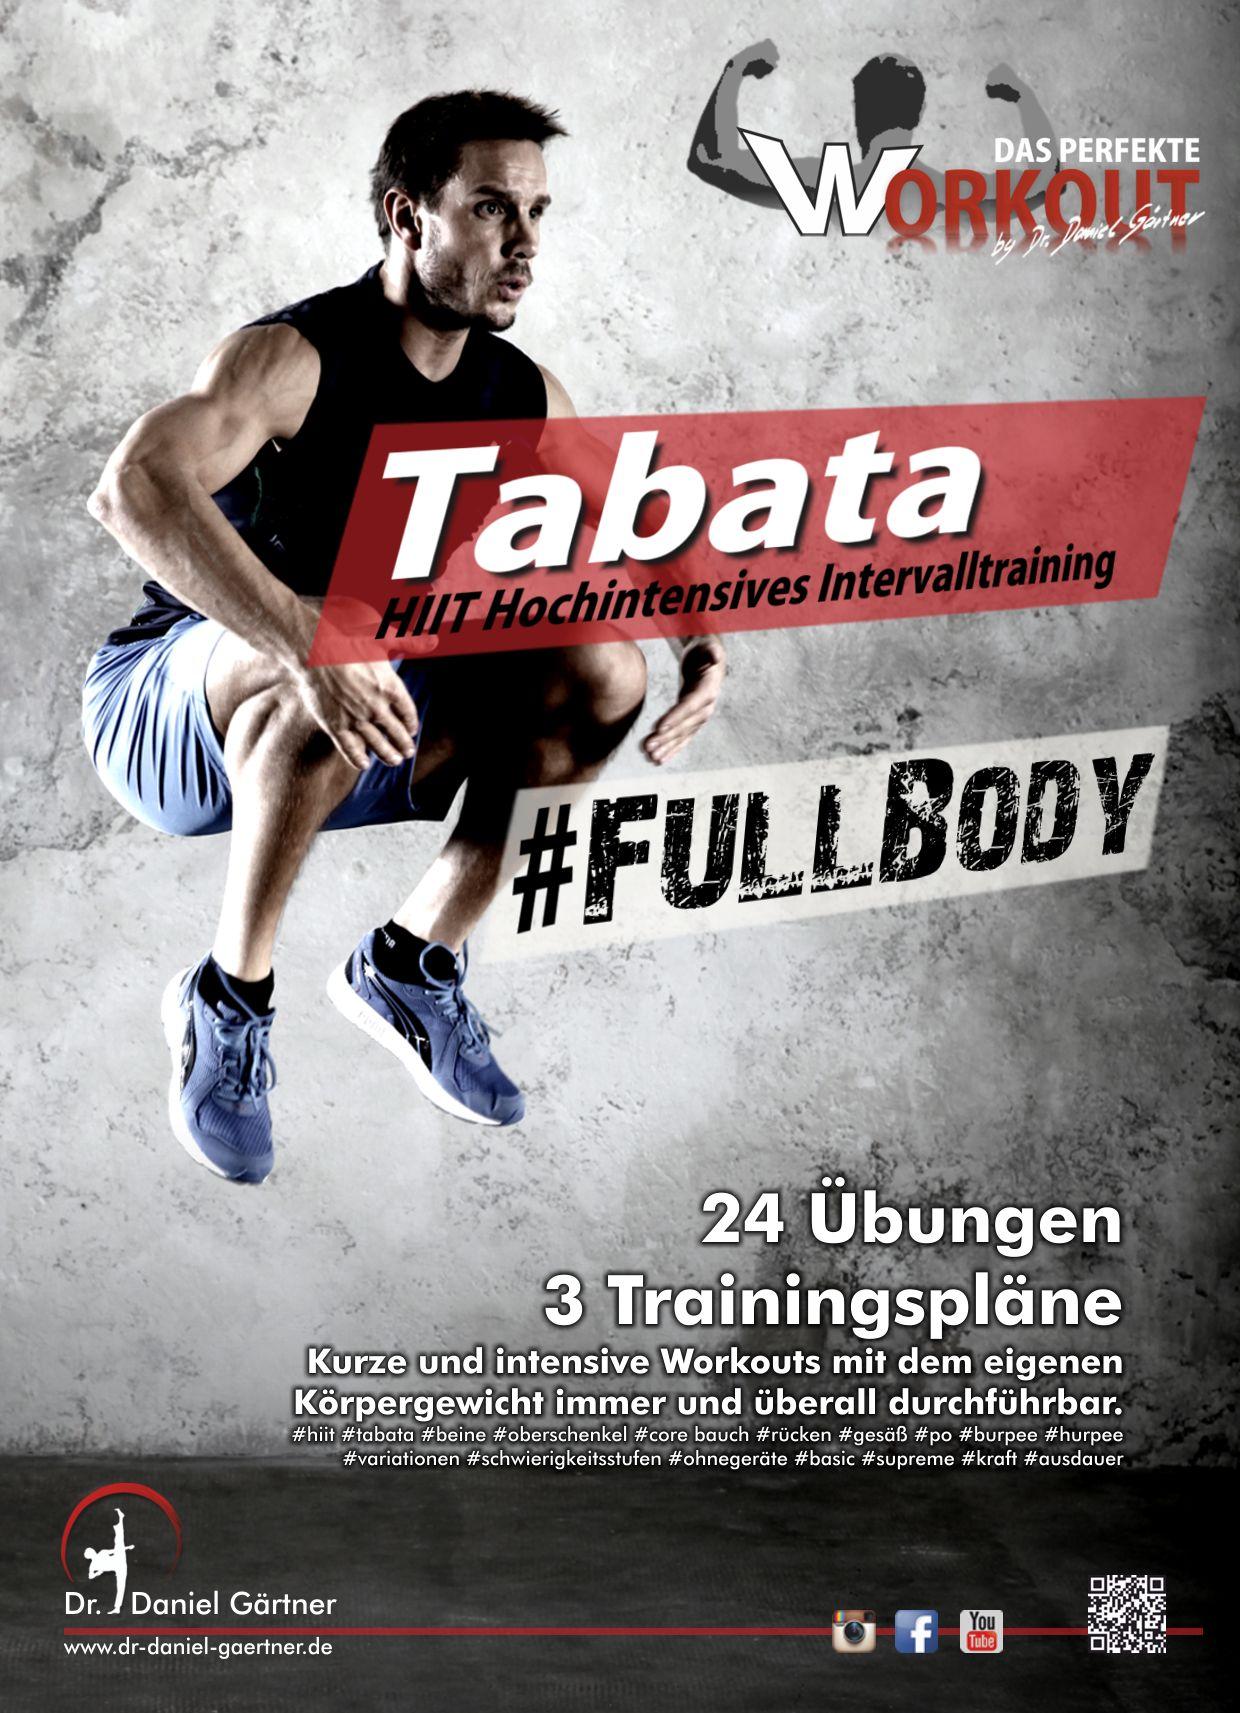 Tabata HIIT Fullbody